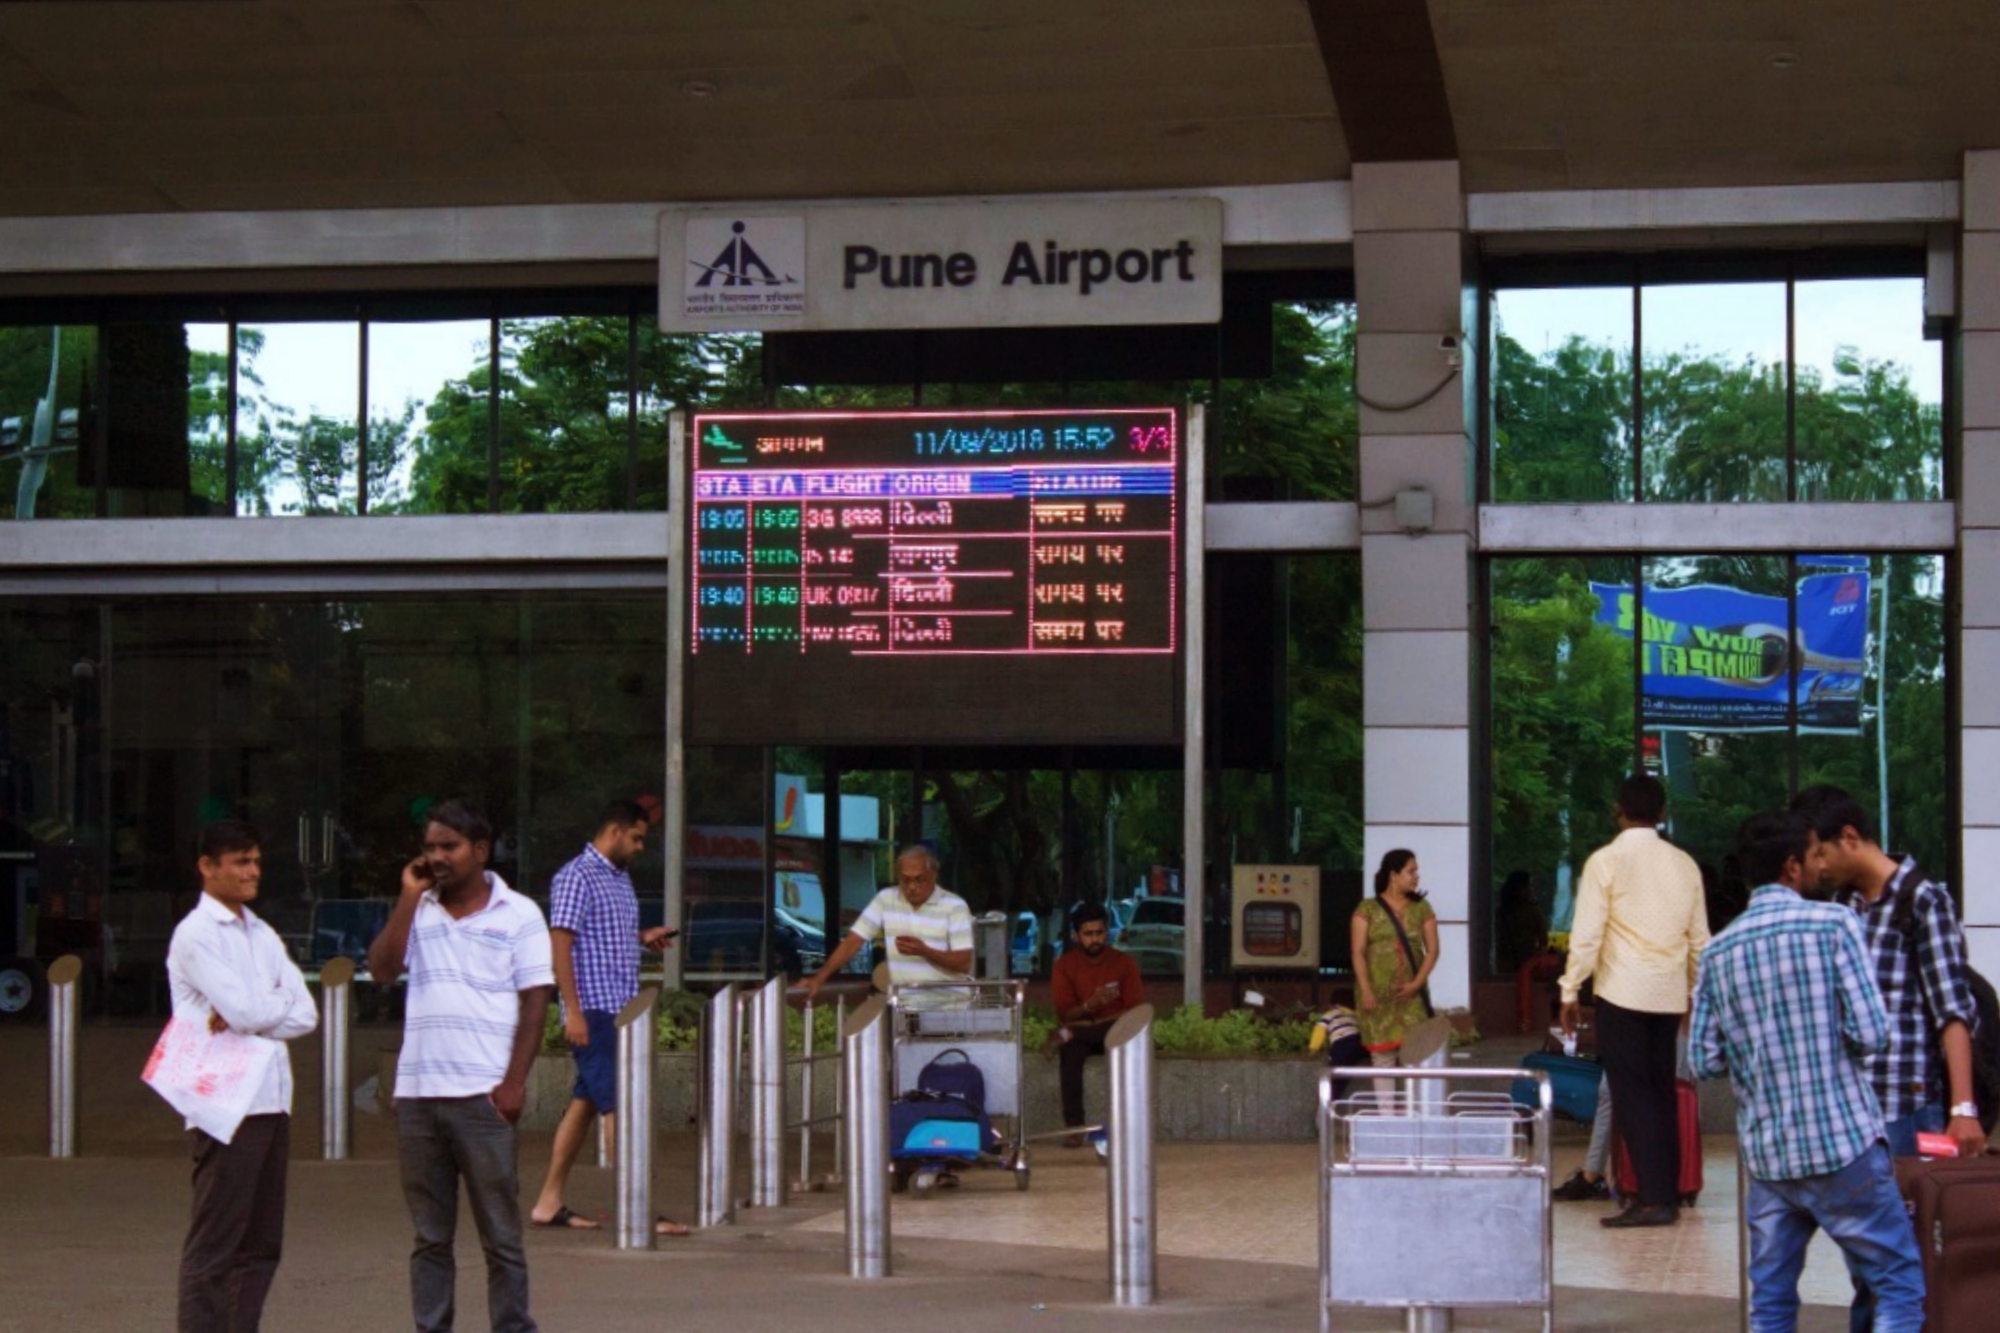 Pune Airport Departure